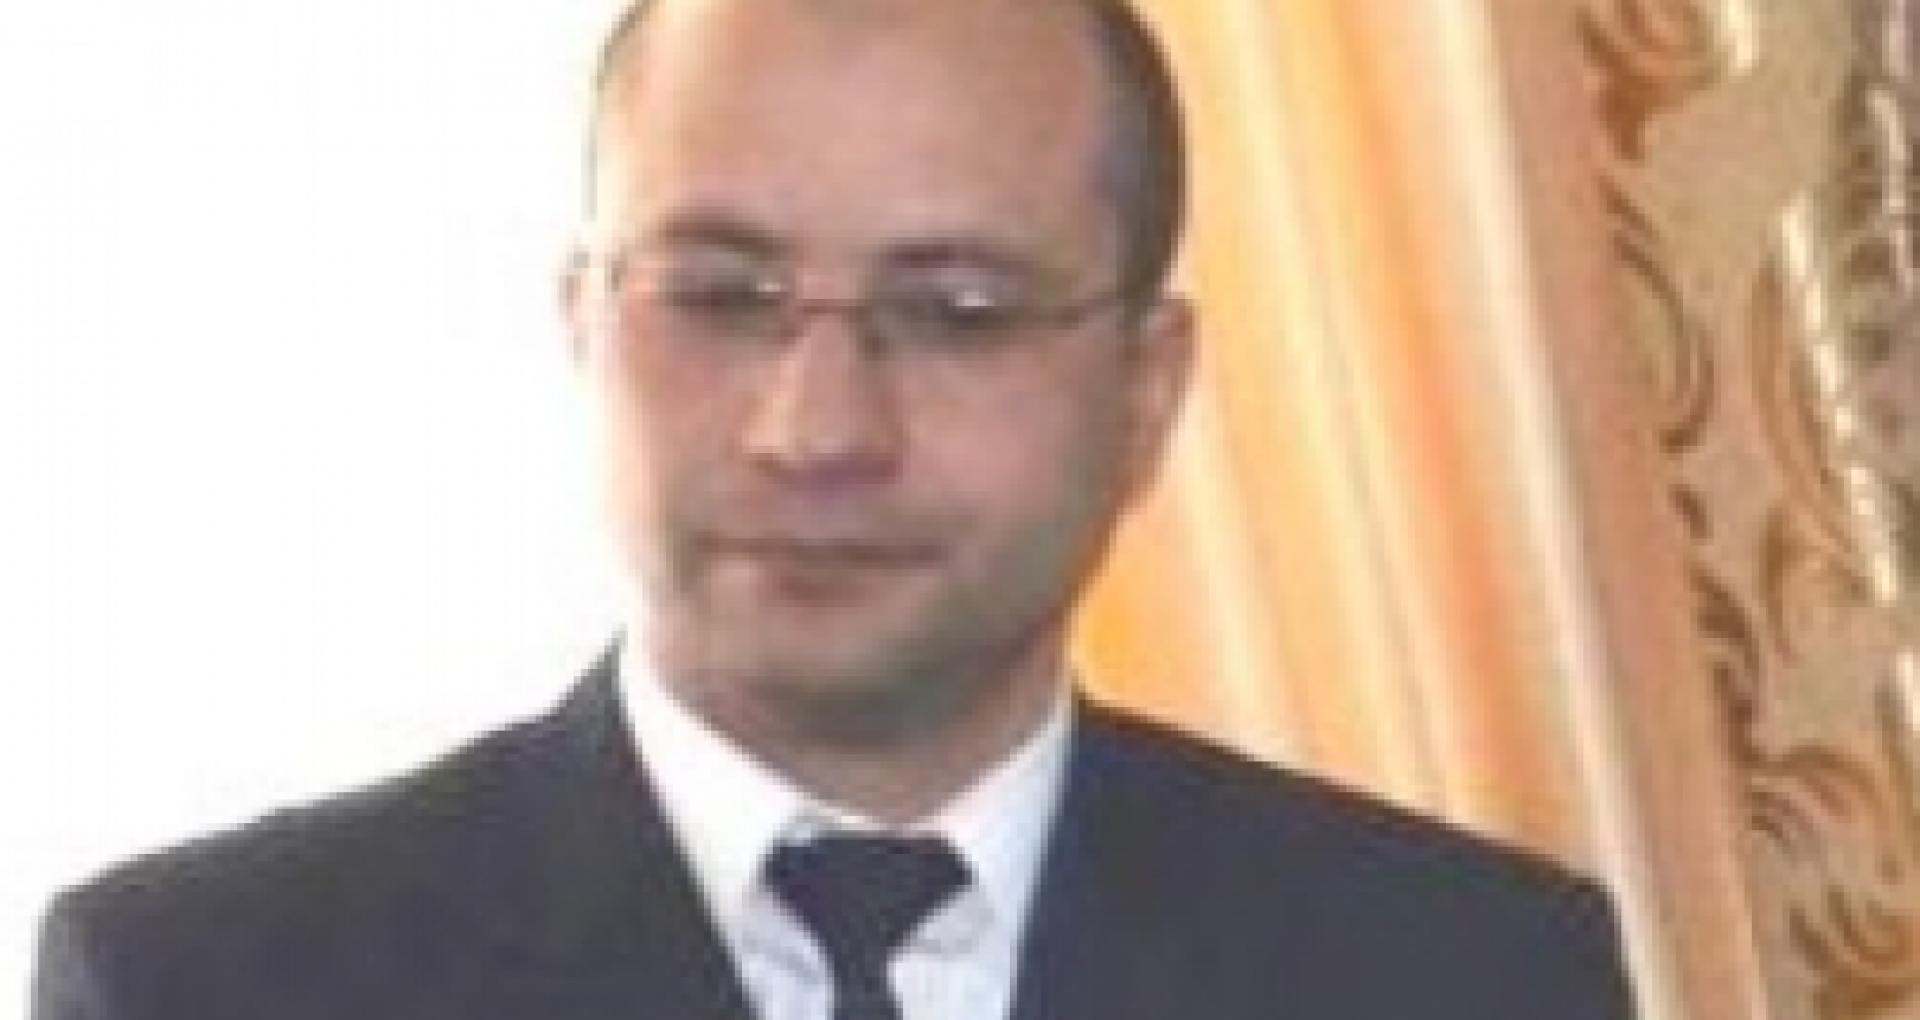 Acuzat de analfabetism juridic, magistratul Nicolae Pasecinic a fost eliberat din sistem